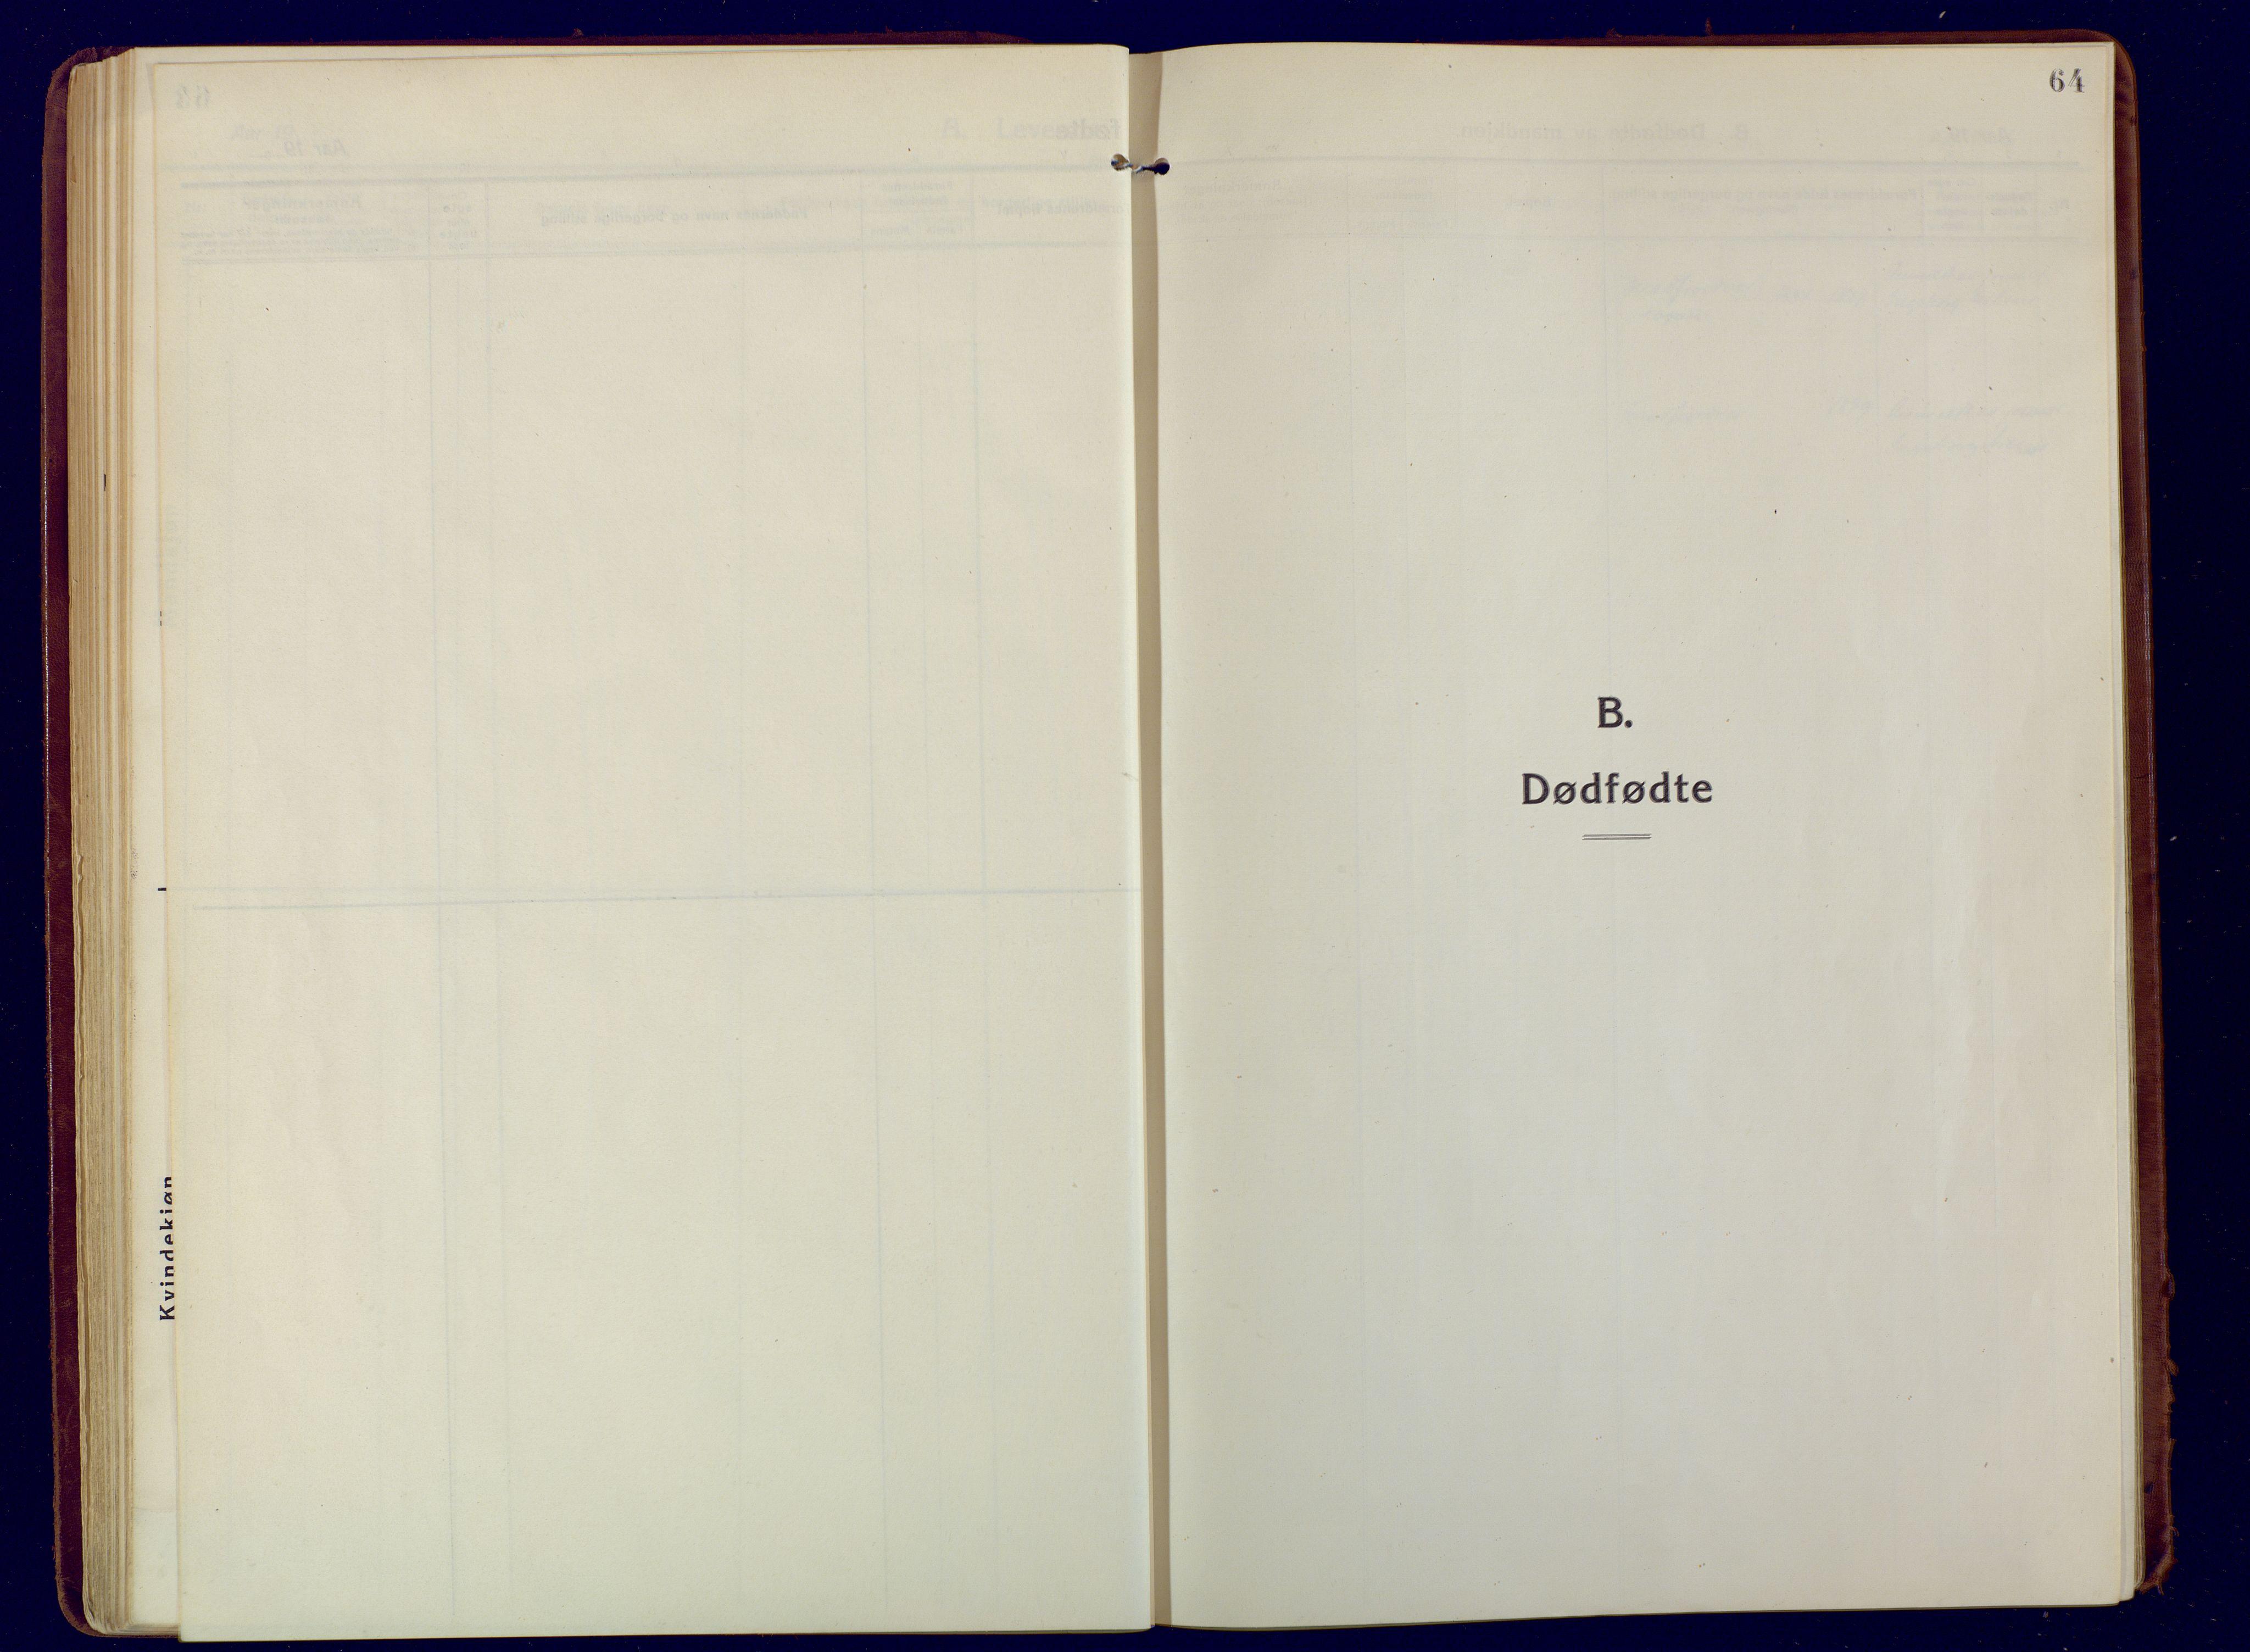 SATØ, Mefjord/Berg sokneprestkontor, G/Ga/Gaa: Ministerialbok nr. 9, 1916-1928, s. 64